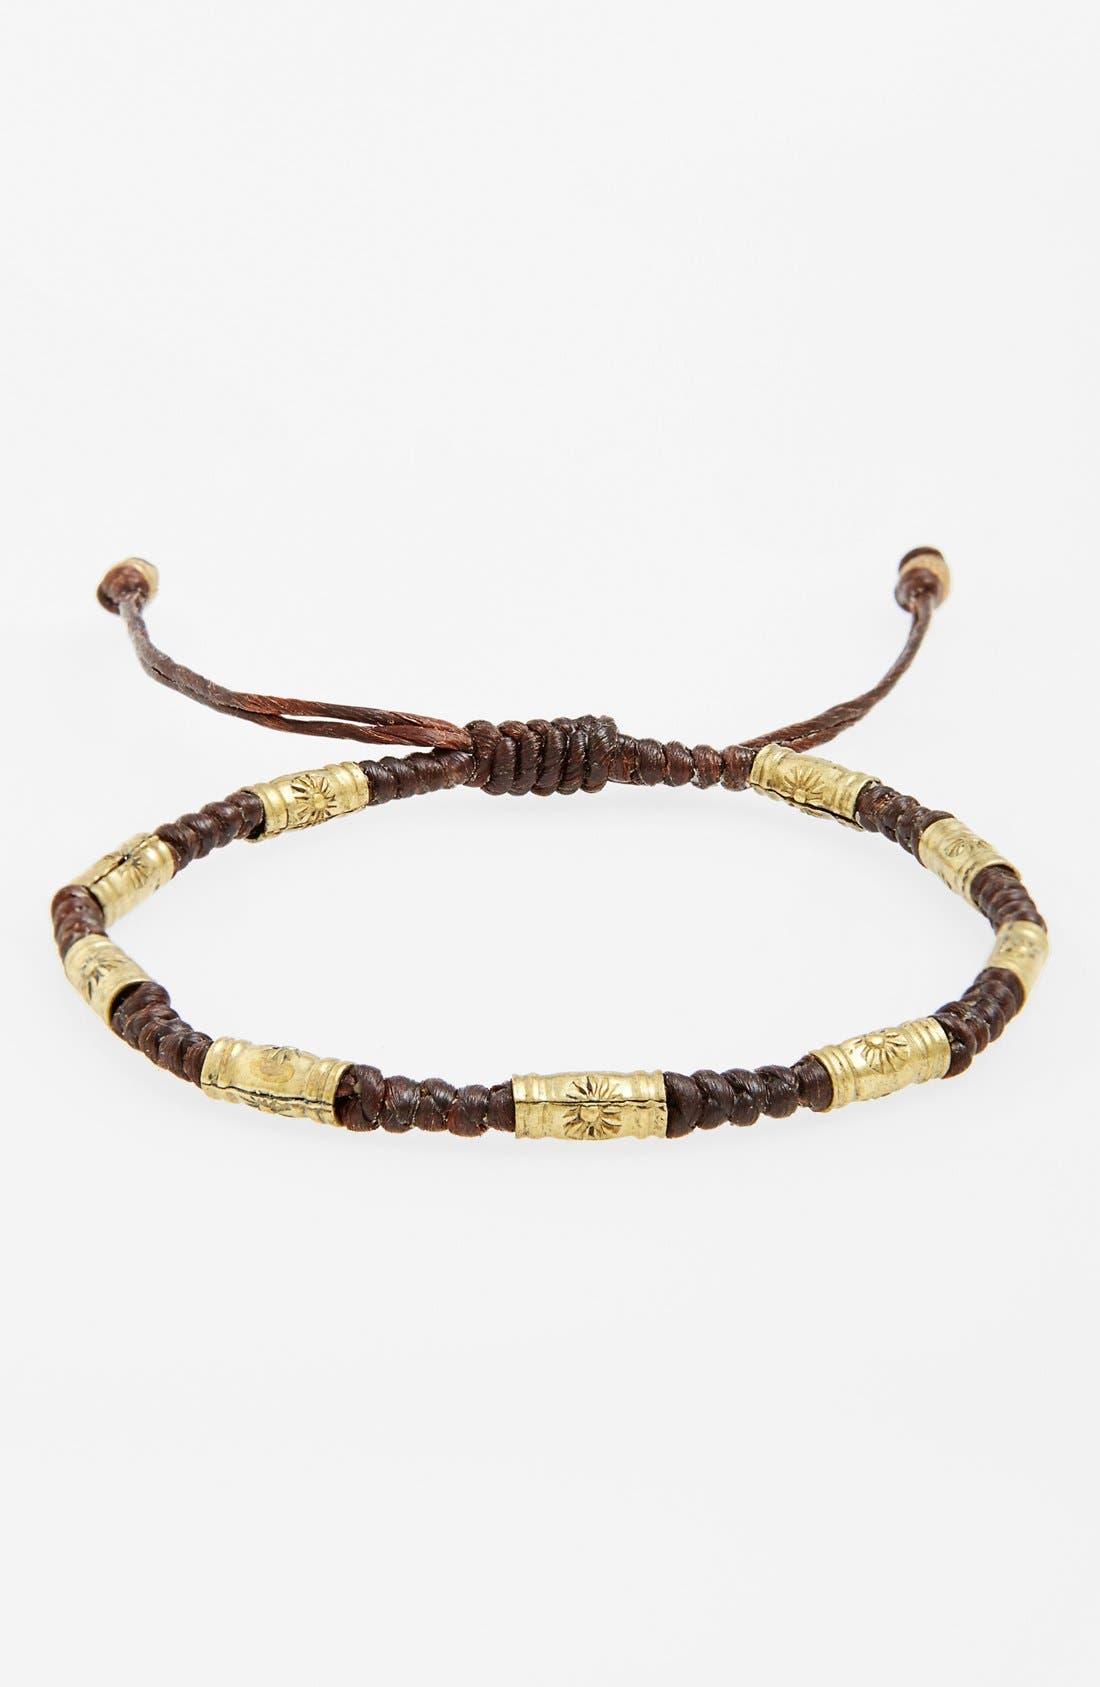 Main Image - Max Reed Skinny Brass Bead Waxed Cord Bracelet